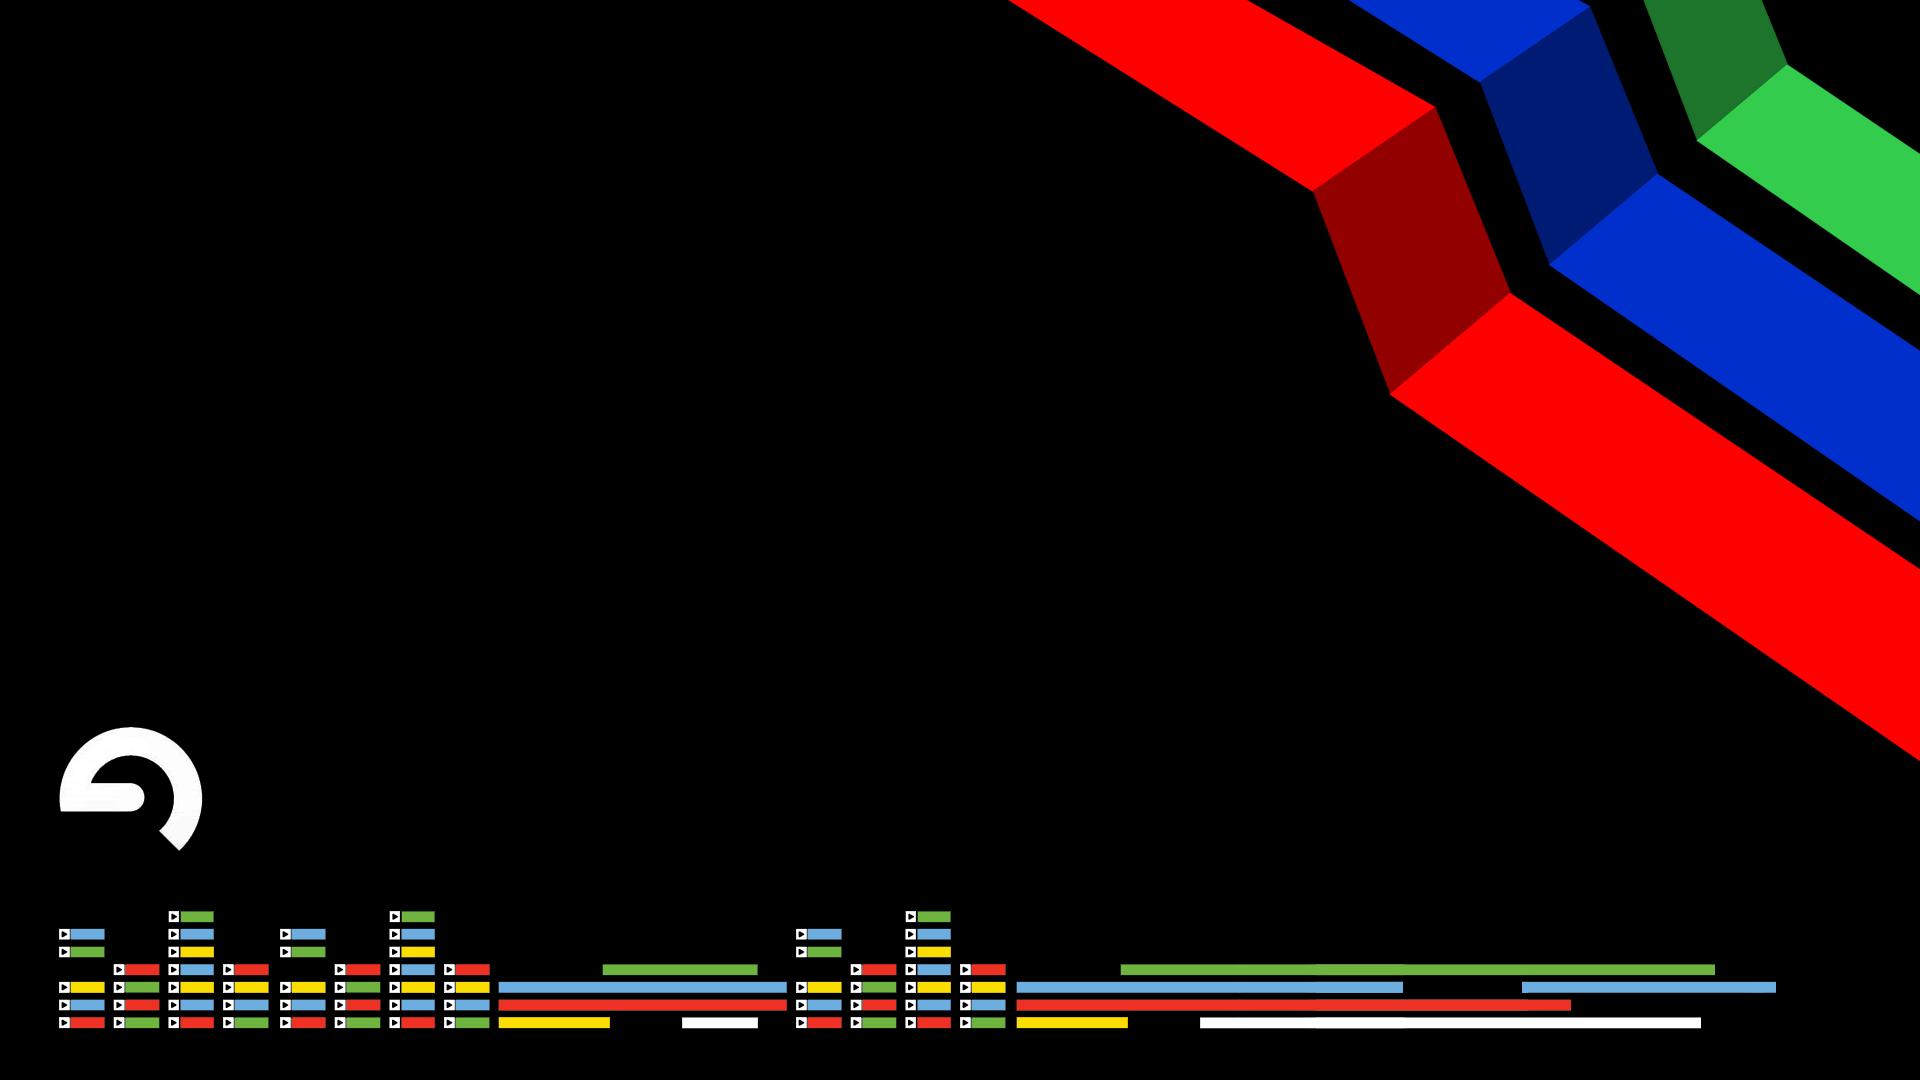 Ableton Play Image 16217 Wallpaper High Resolution Wallarthdcom 1920x1080